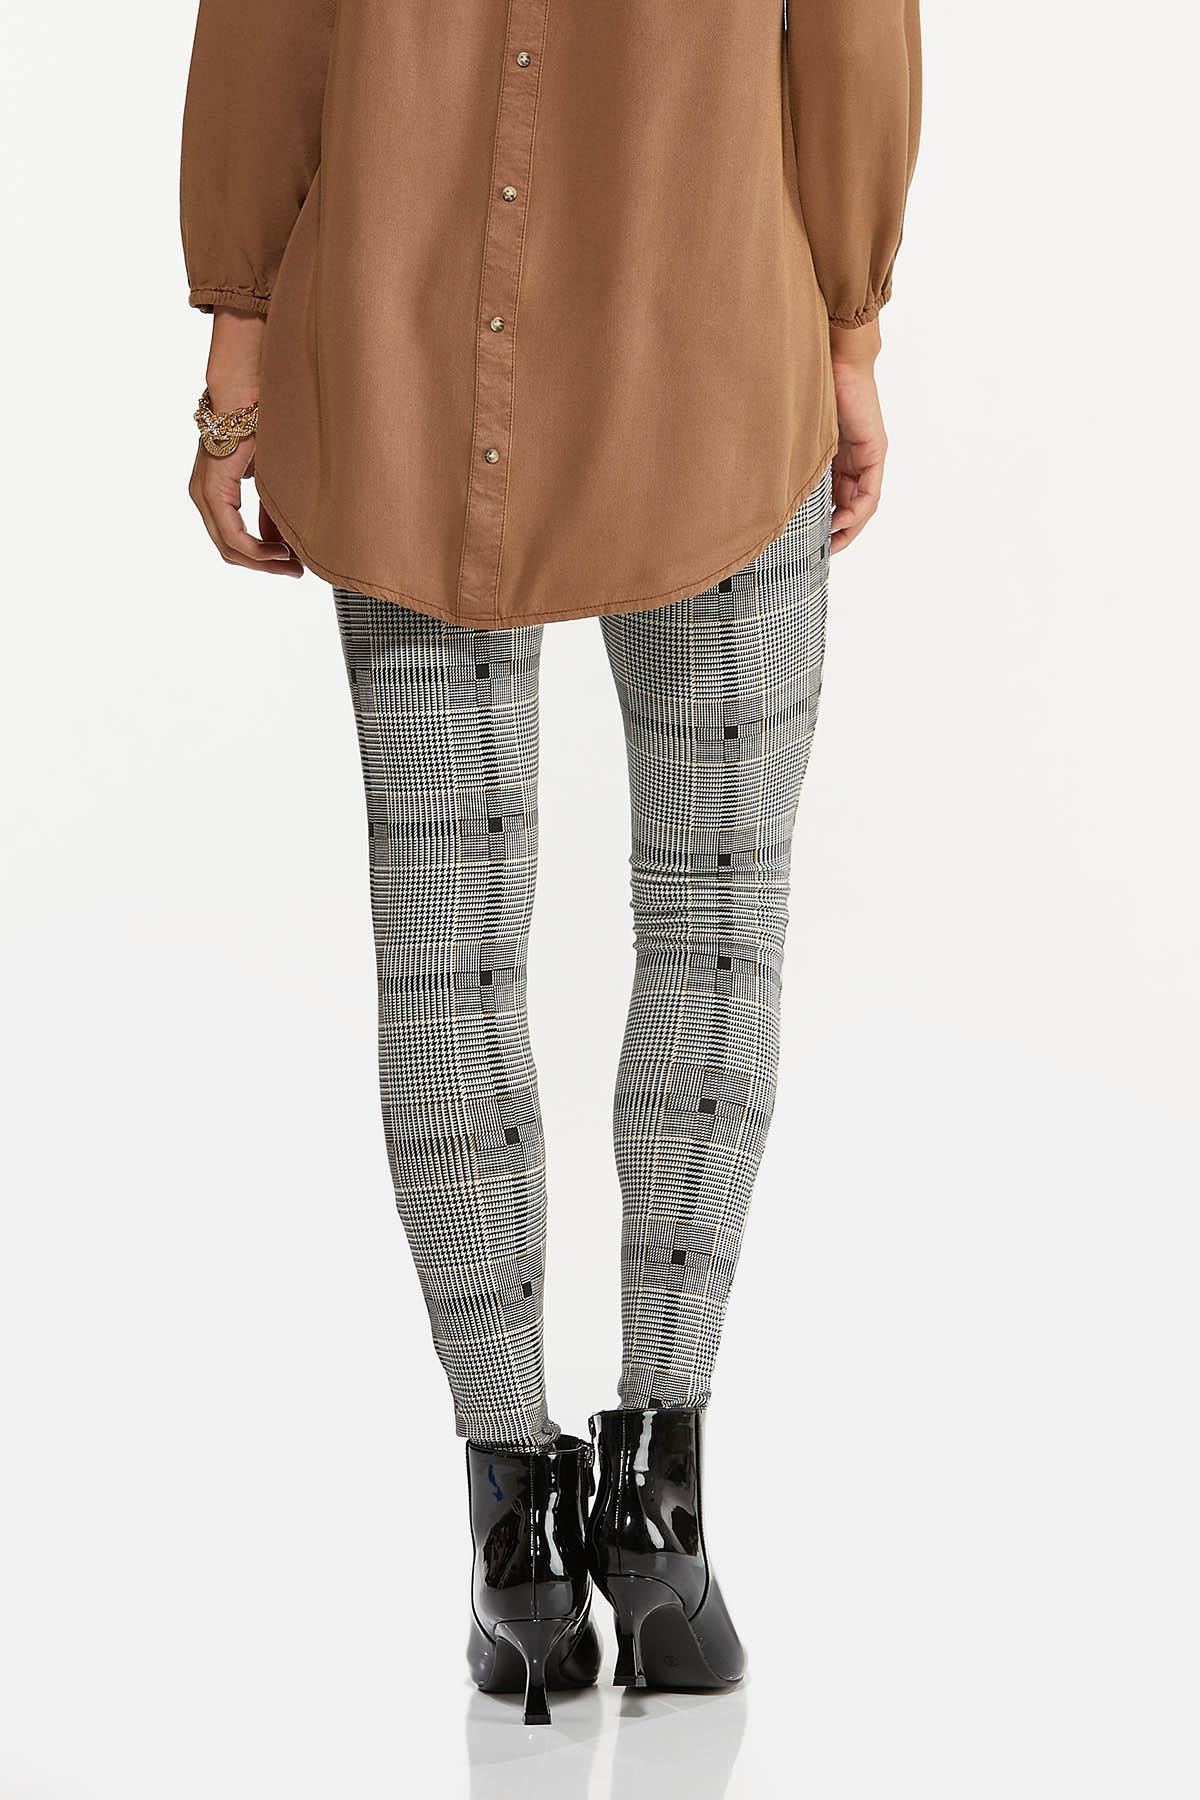 Houndstooth Plaid Leggings (Item #44654897)